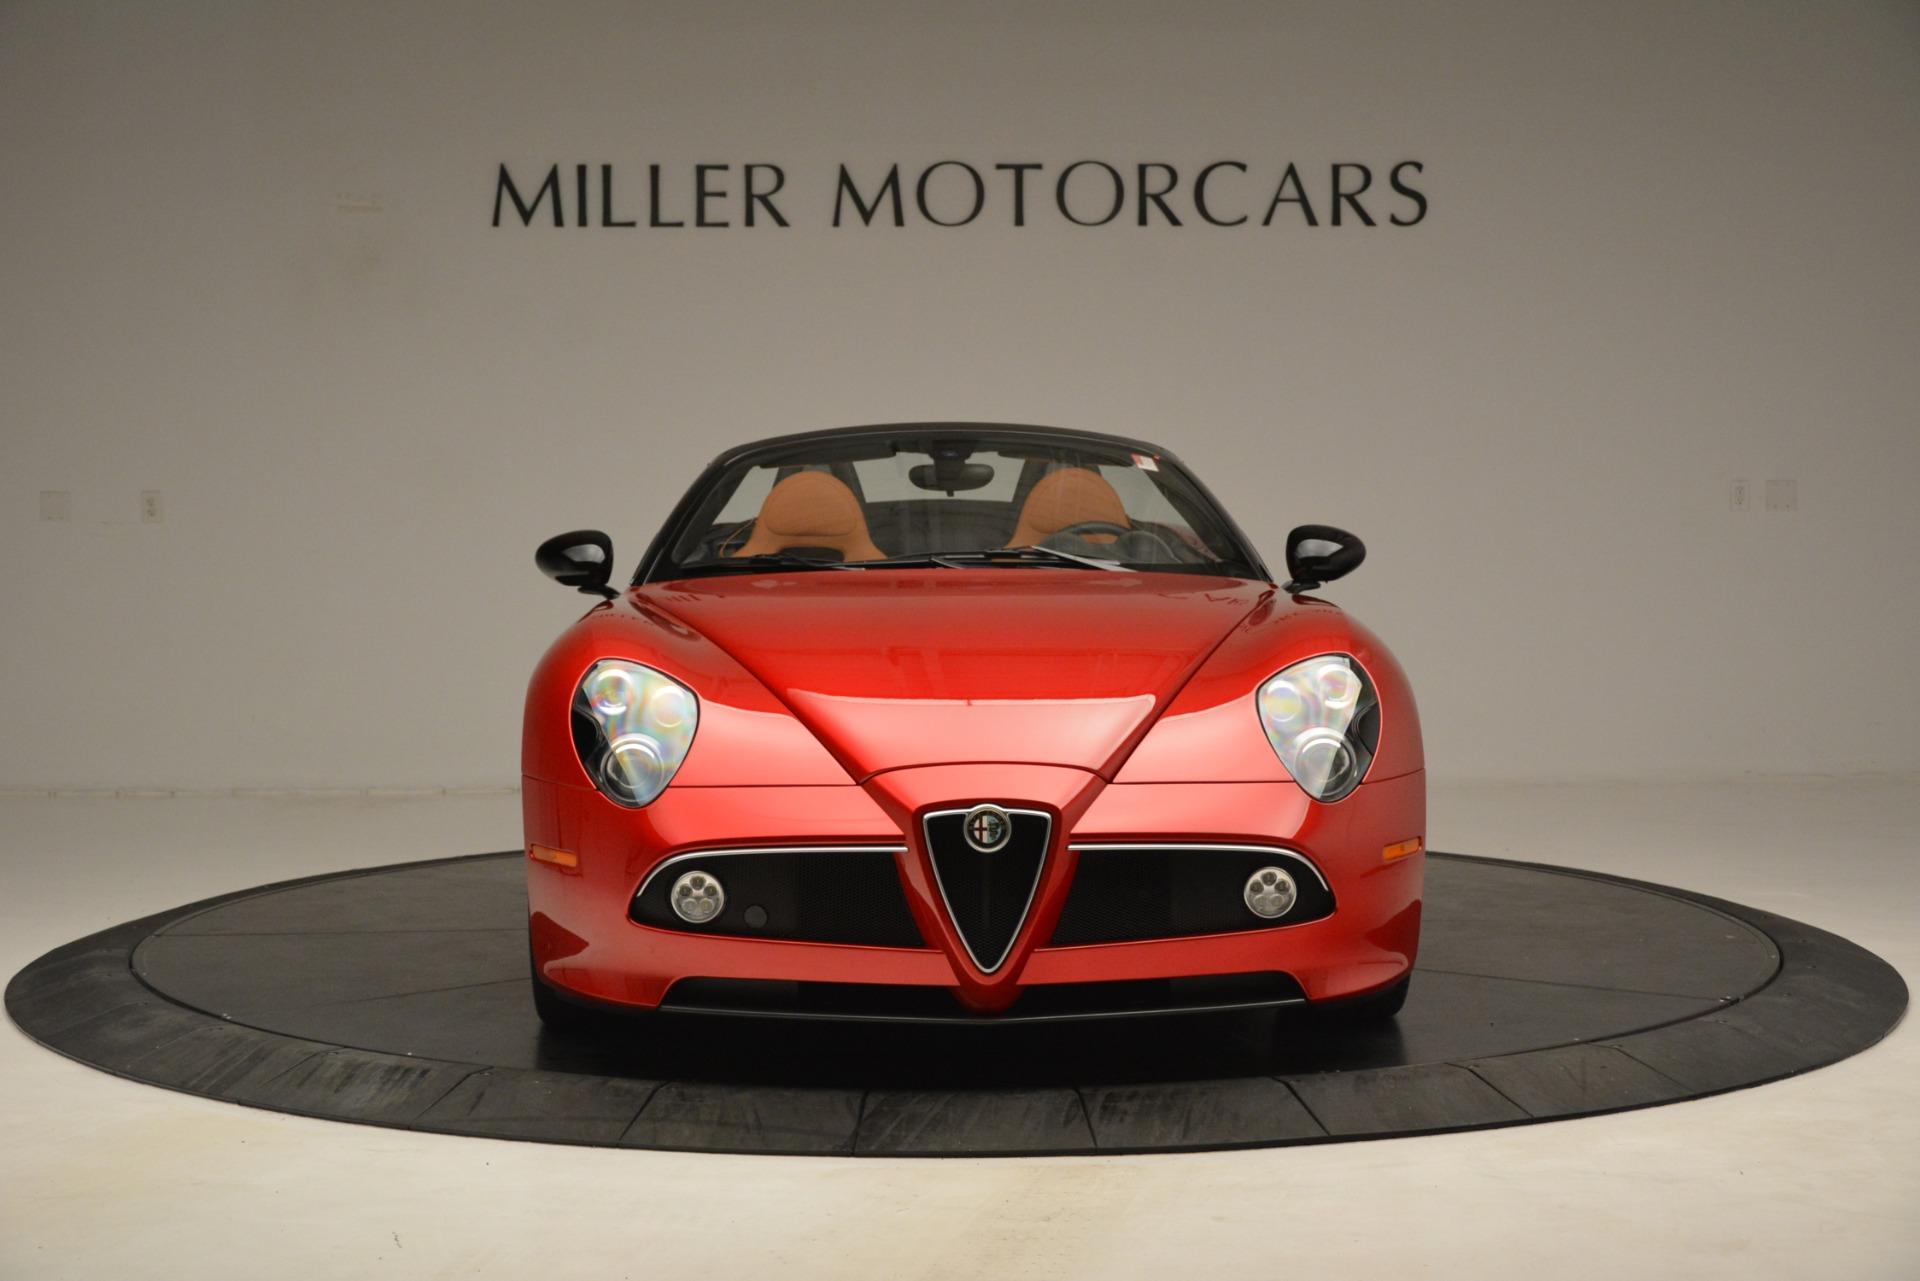 Used 2009 Alfa Romeo 8c Spider  For Sale In Greenwich, CT 3302_p7